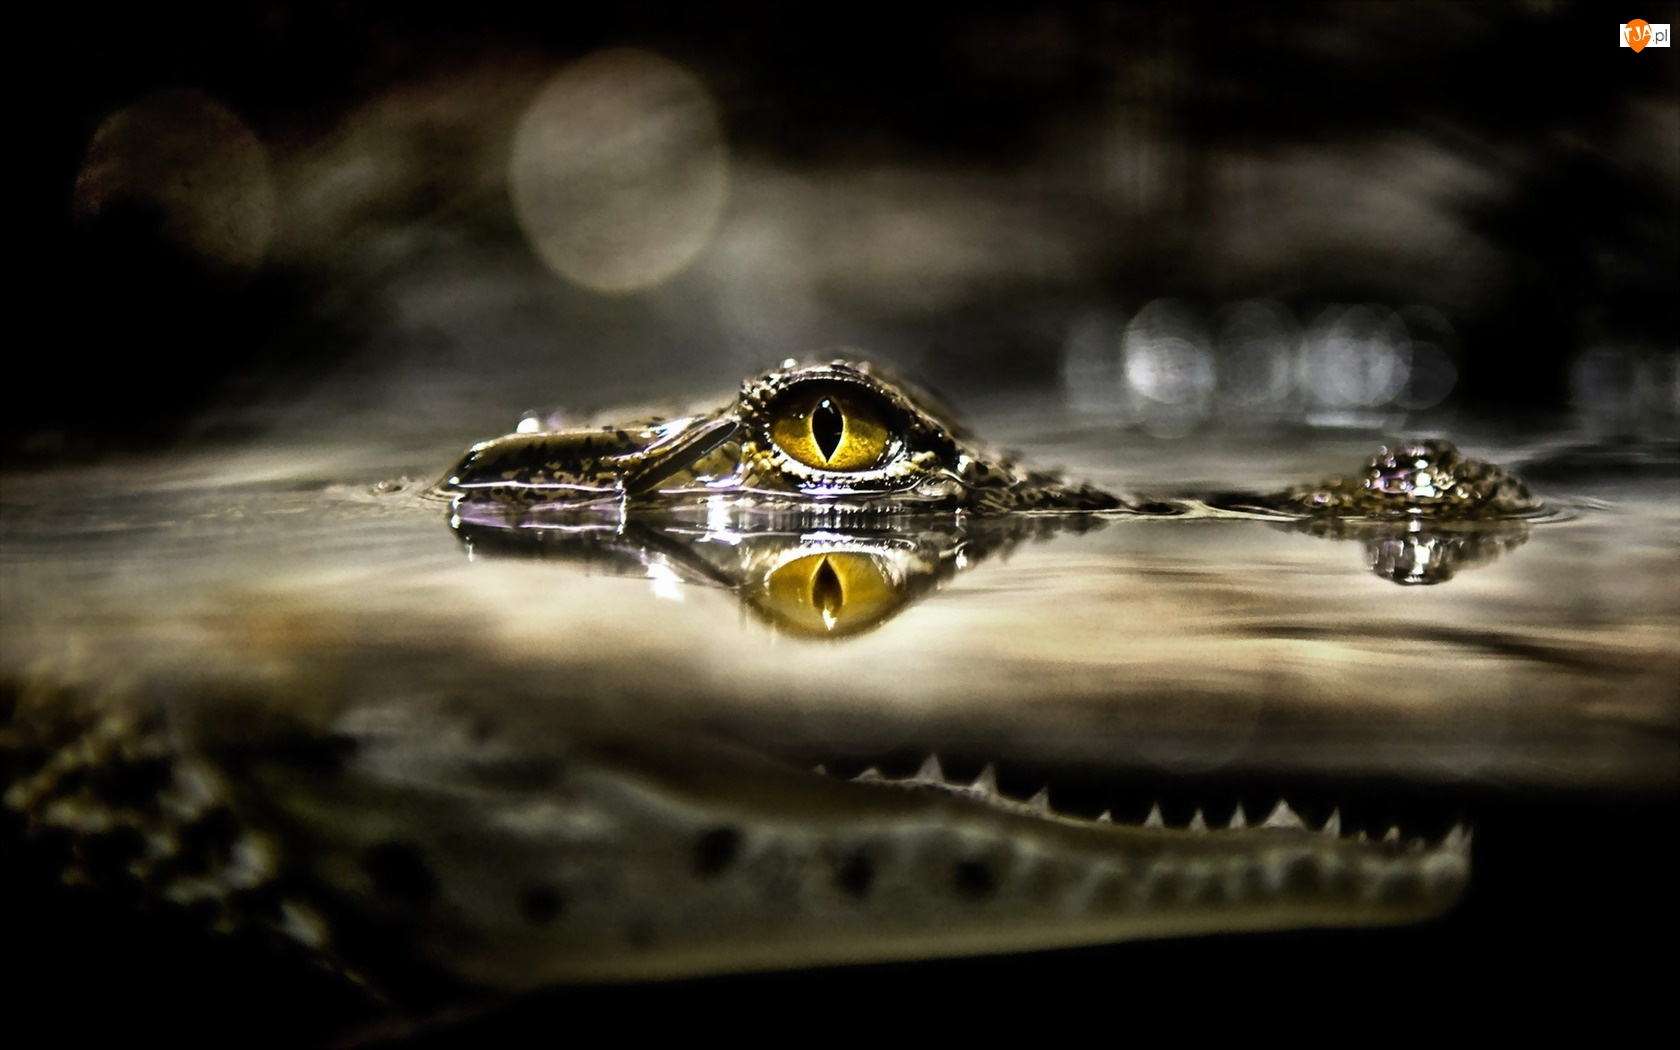 Krokodyl, Oko